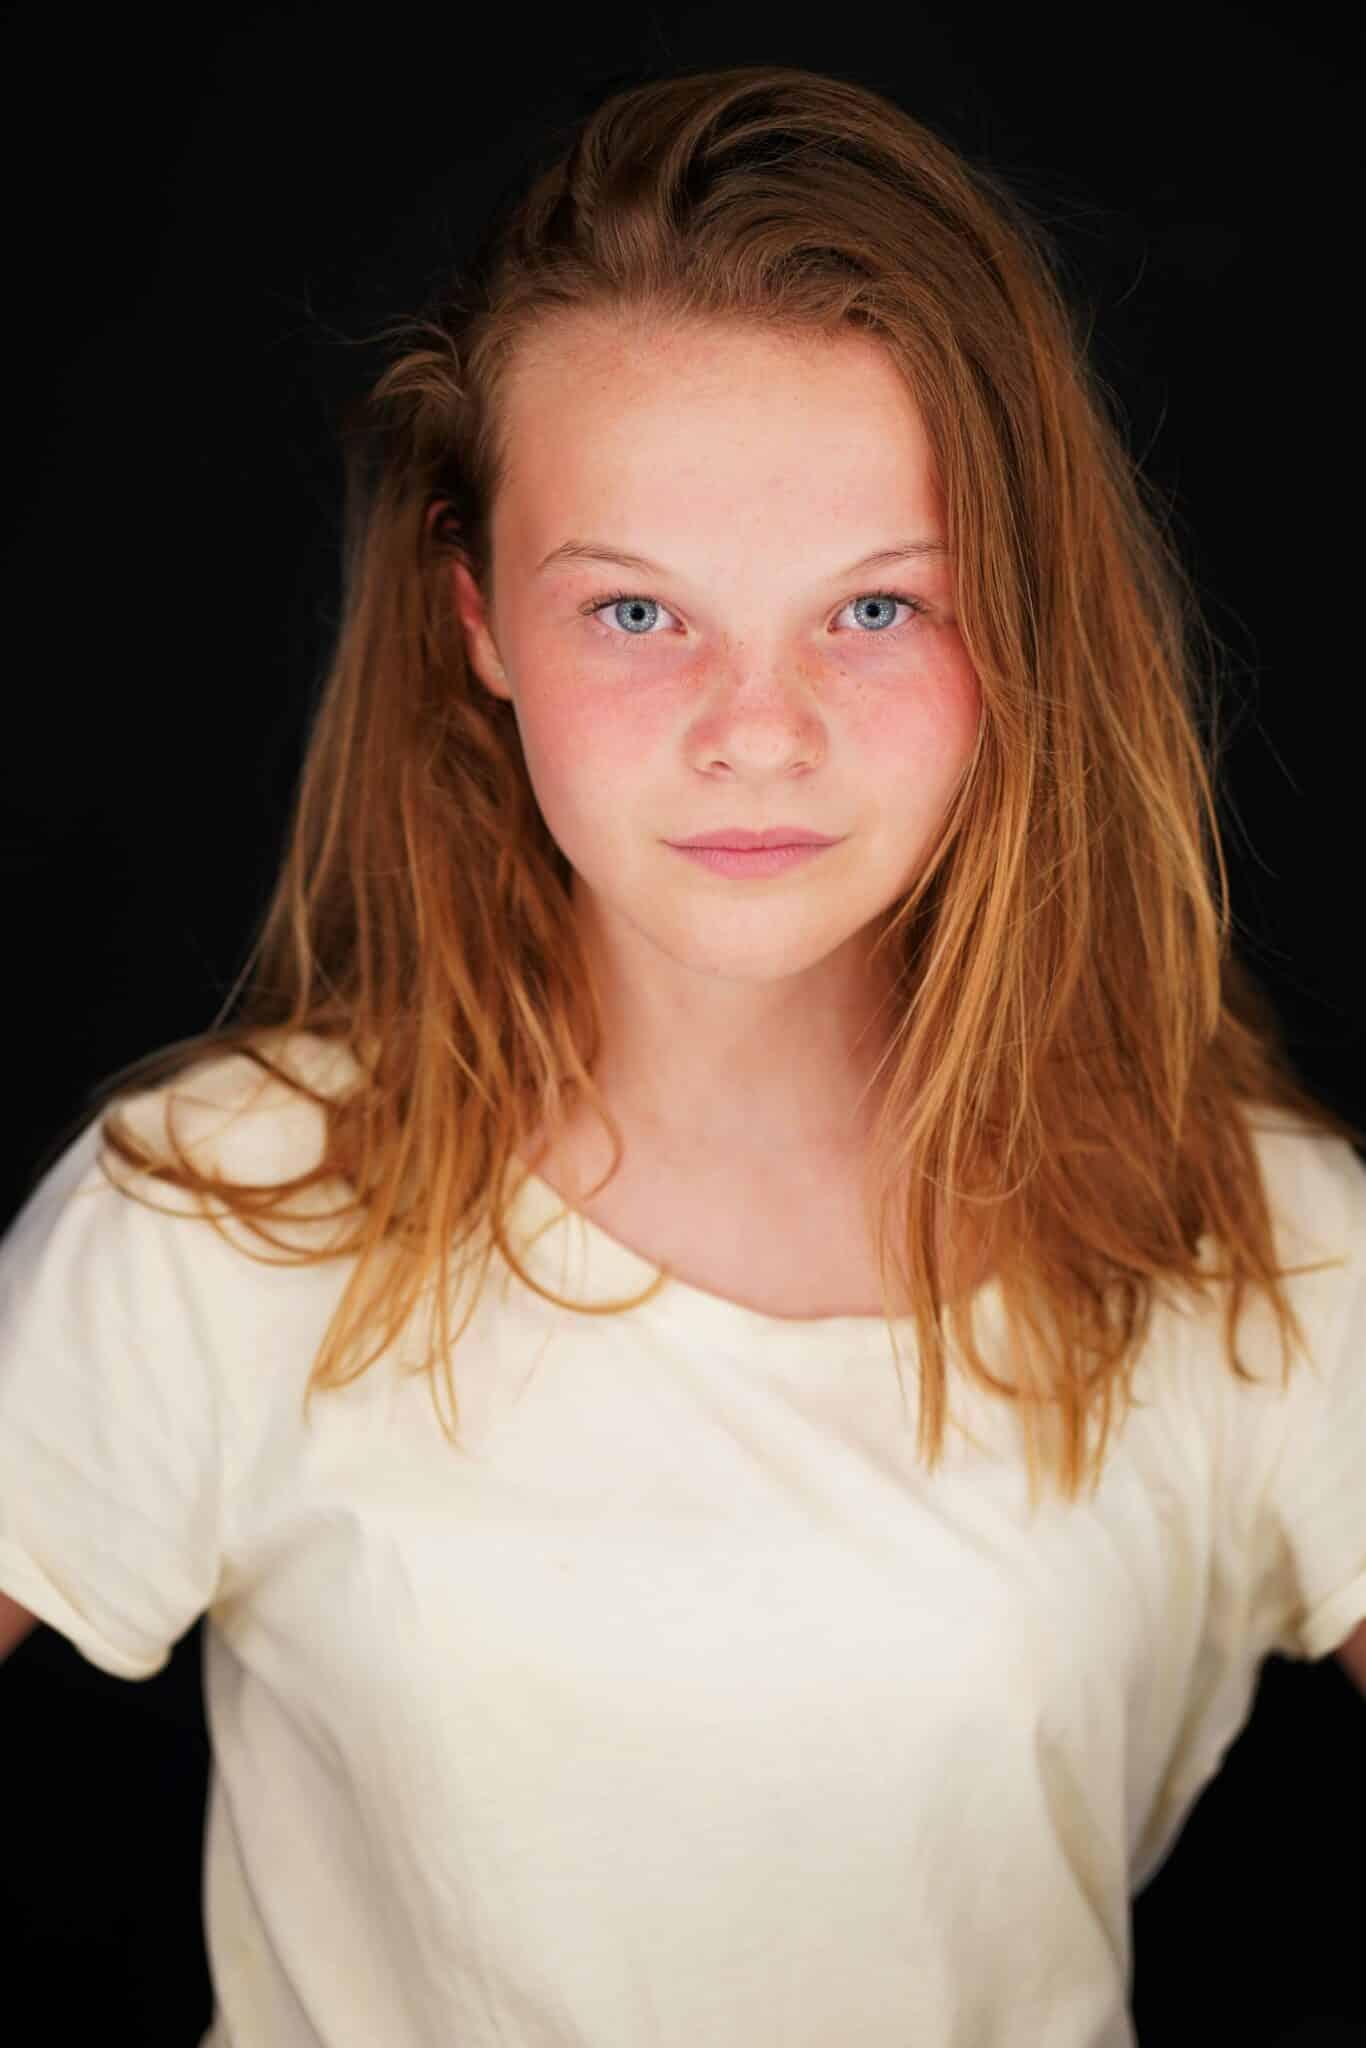 Studio Koudijs beauty en portret fotoshoot